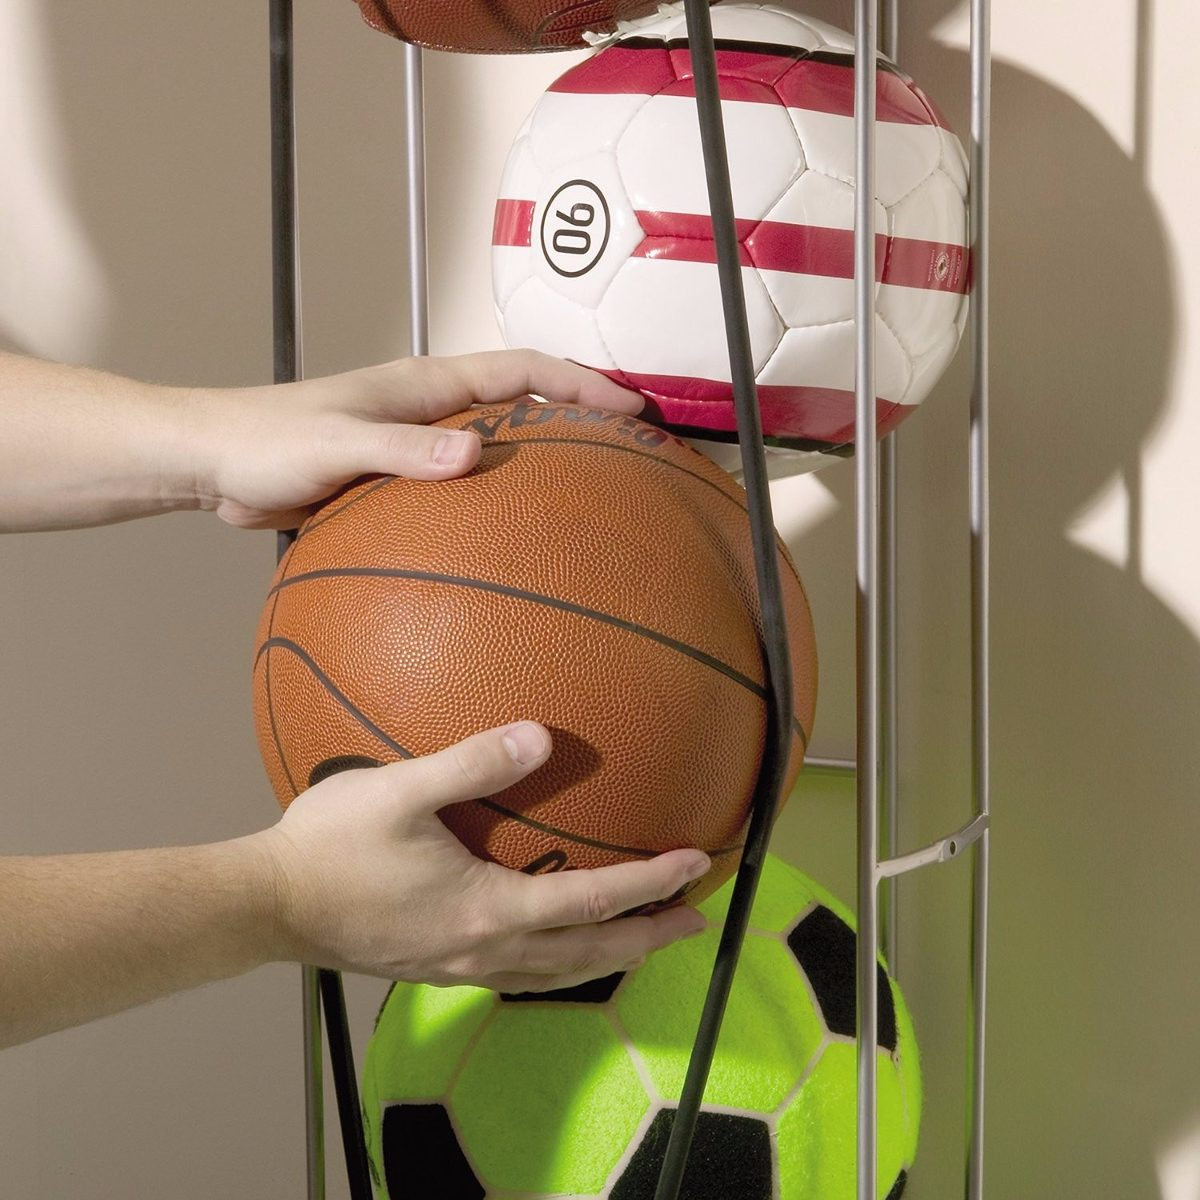 Balonera Jaula Red Para Guardar Balones Futbol Basquetbol